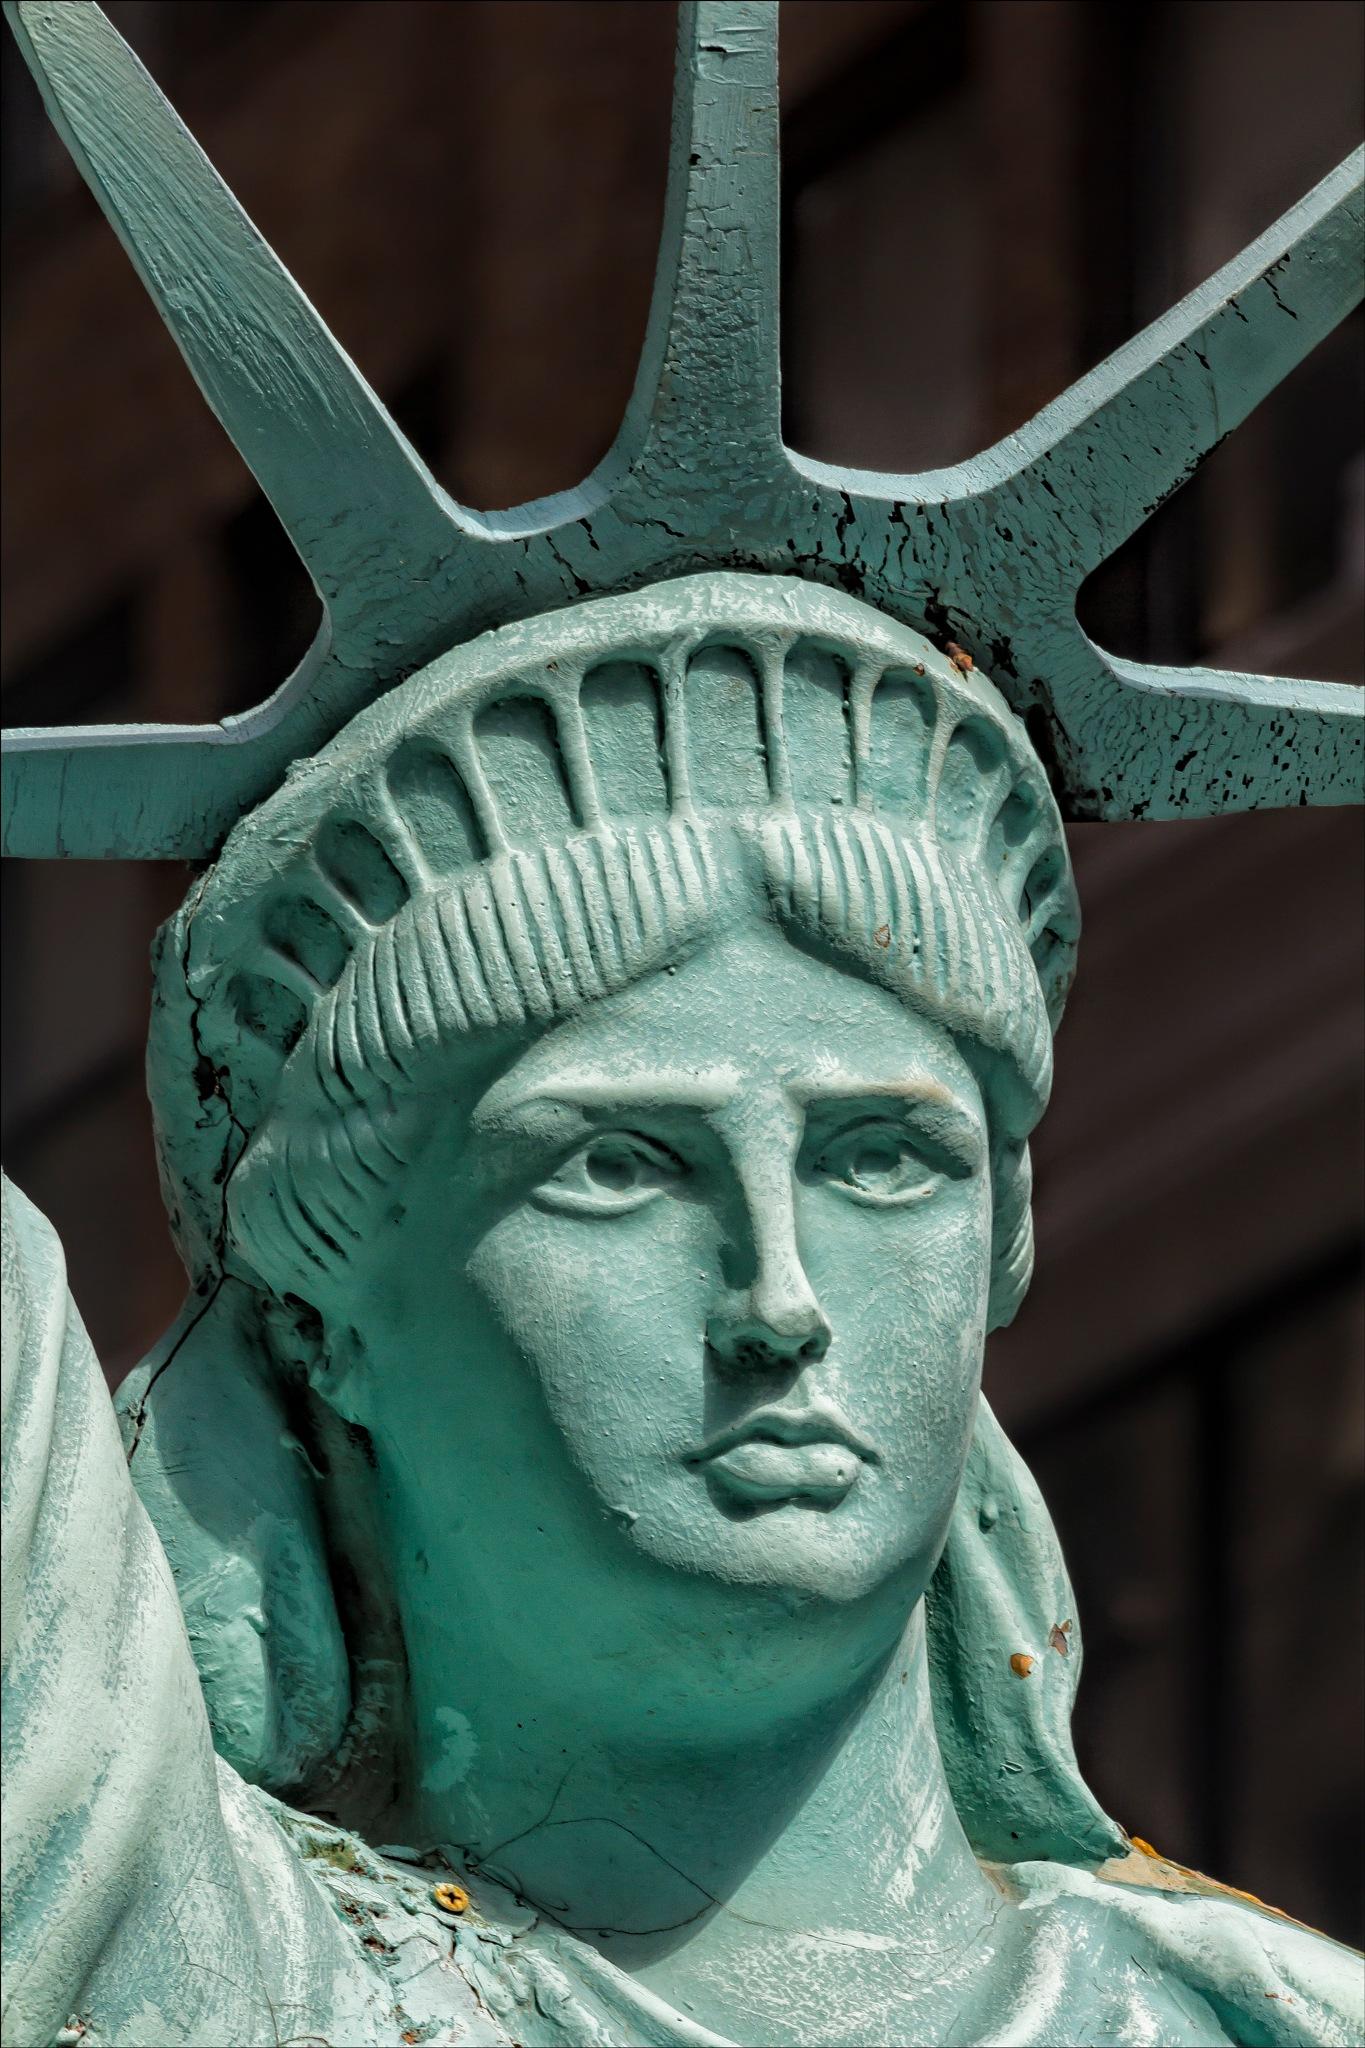 Pakistani Day Parade Model of Statue of Liberty by robertullmann